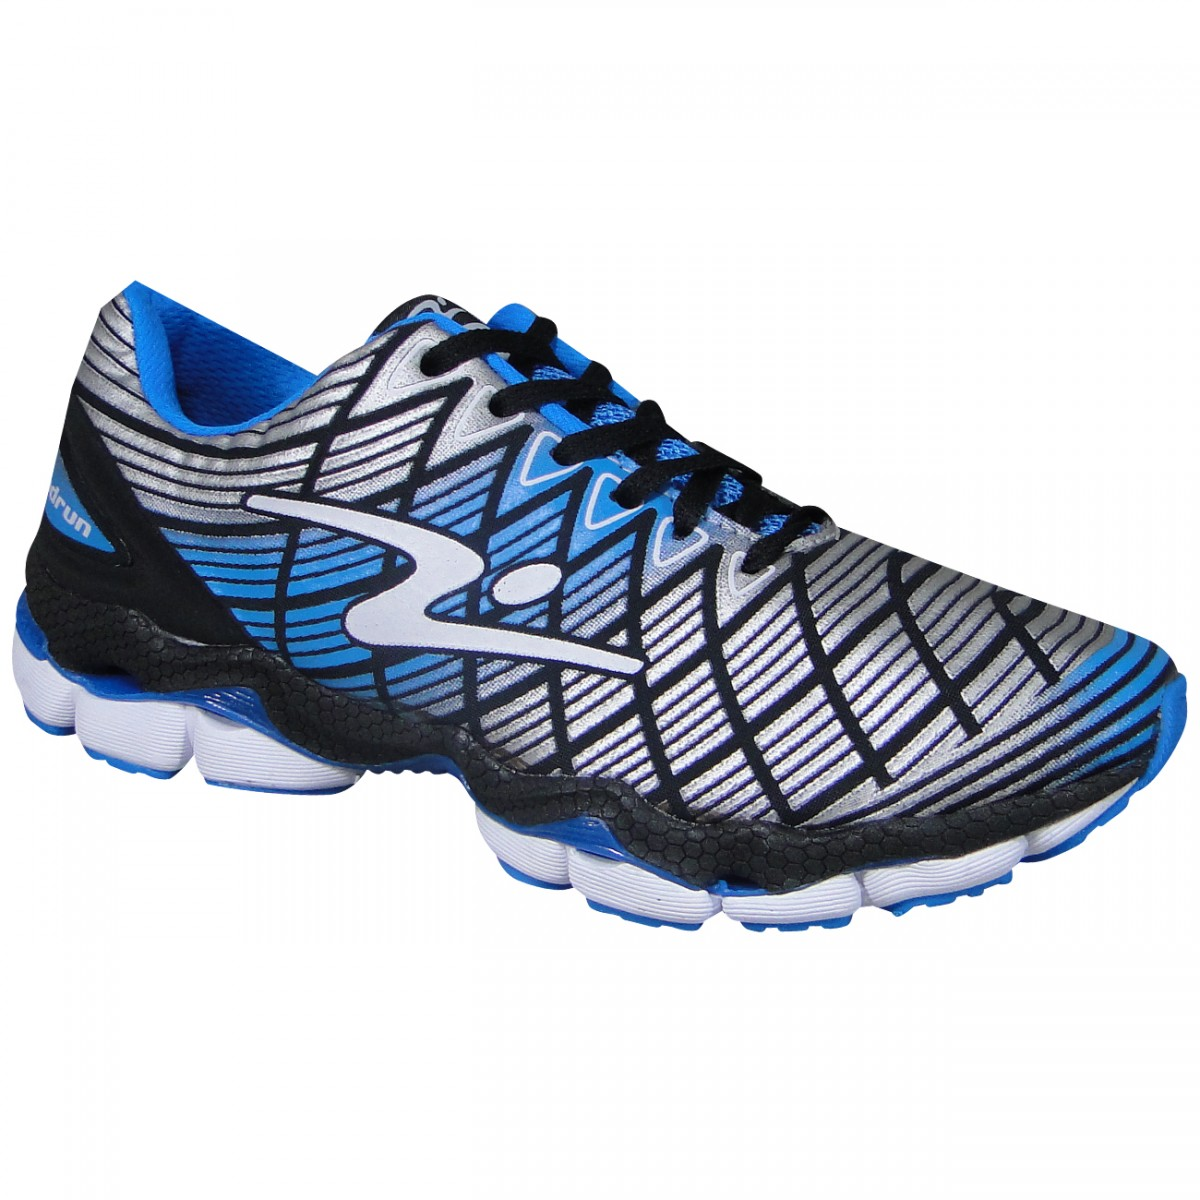 Tenis Adrun Bend 07004M 959 - Preto Prata Azul - Chuteira Nike ... 5561187025587